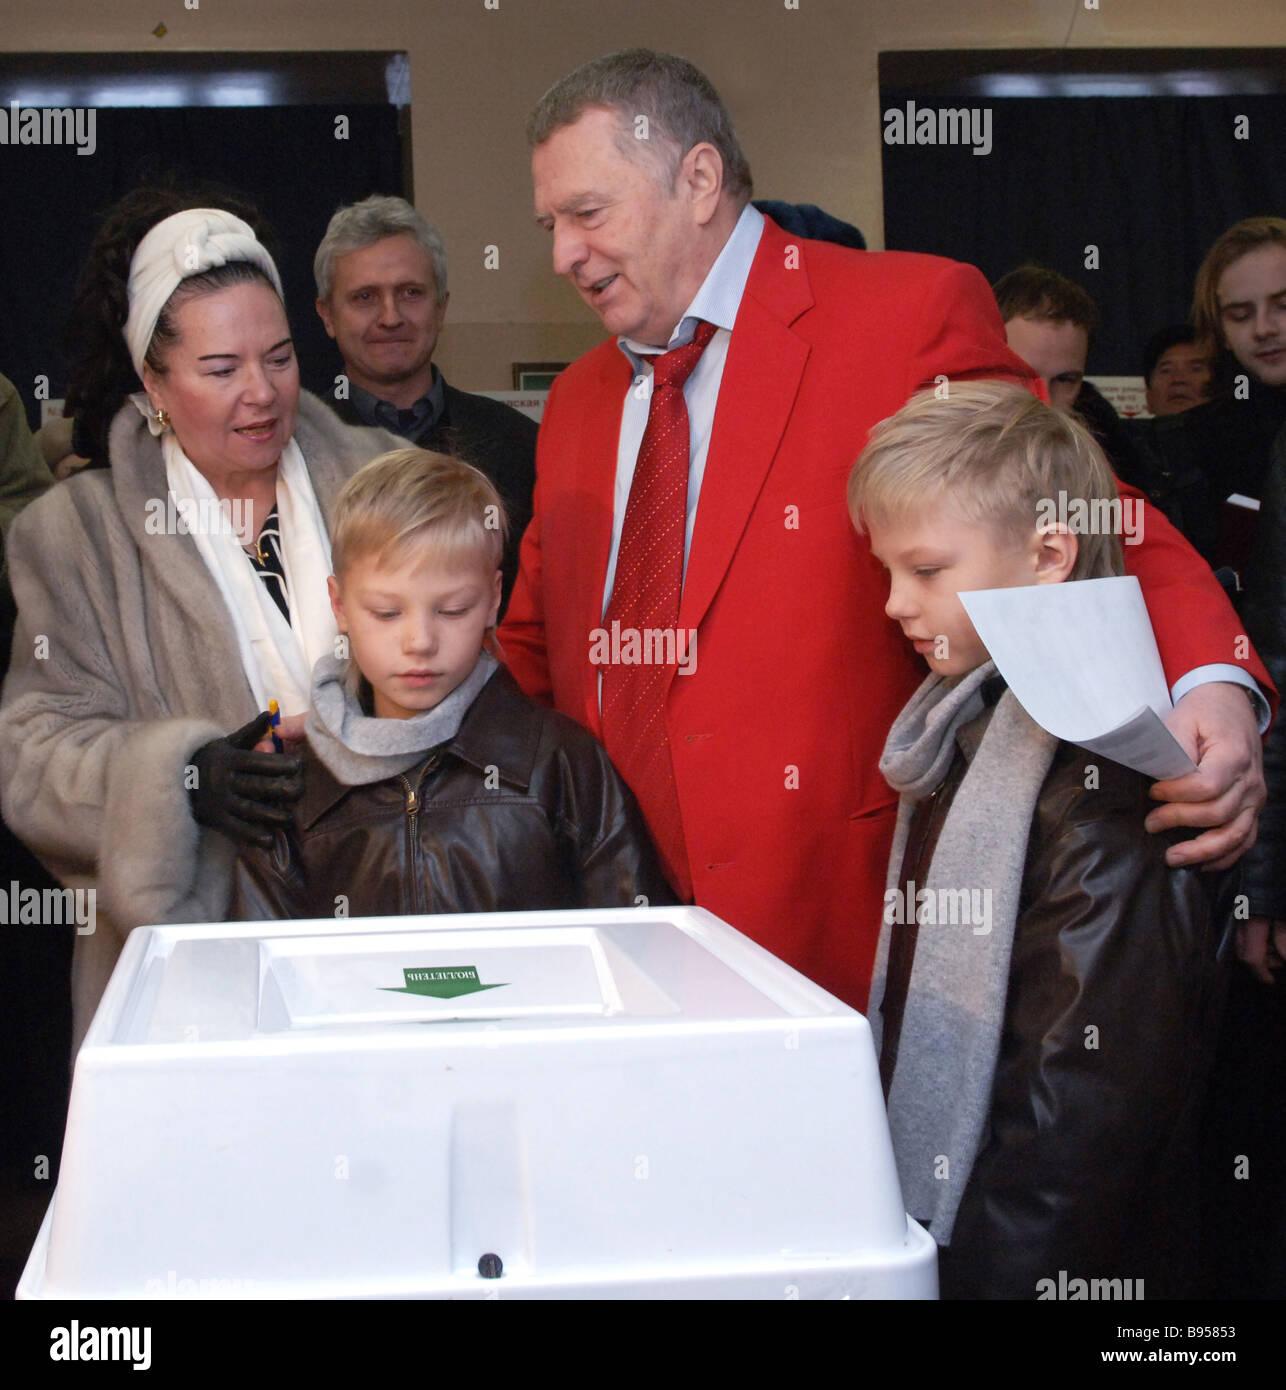 Children Zhirinovsky Vladimir Volfovich. Personal life and family